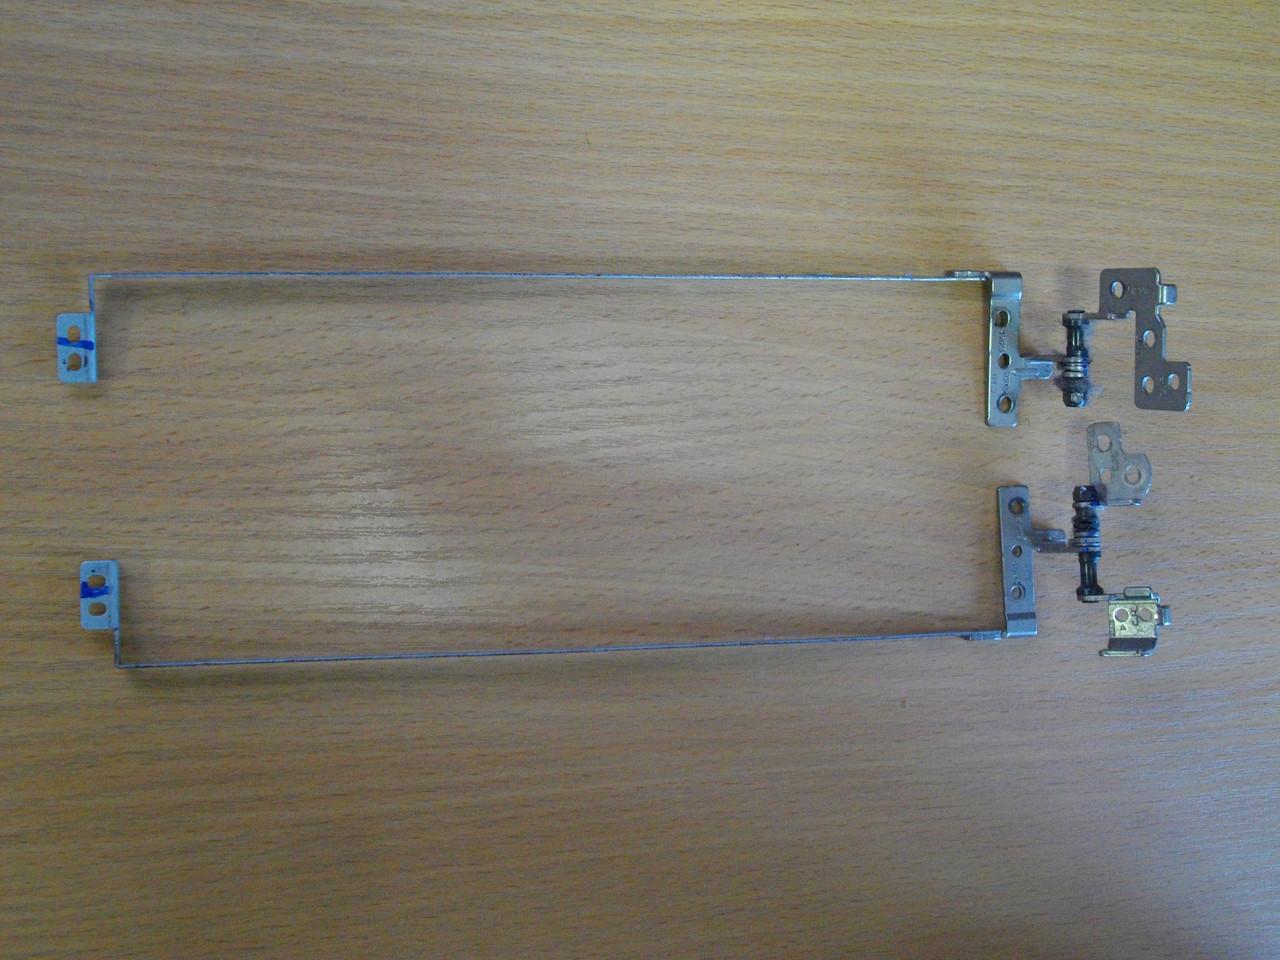 Петли AM0Y0000400 AM0Y0000300 для Lenovo G500 G505 G510 G515 бу